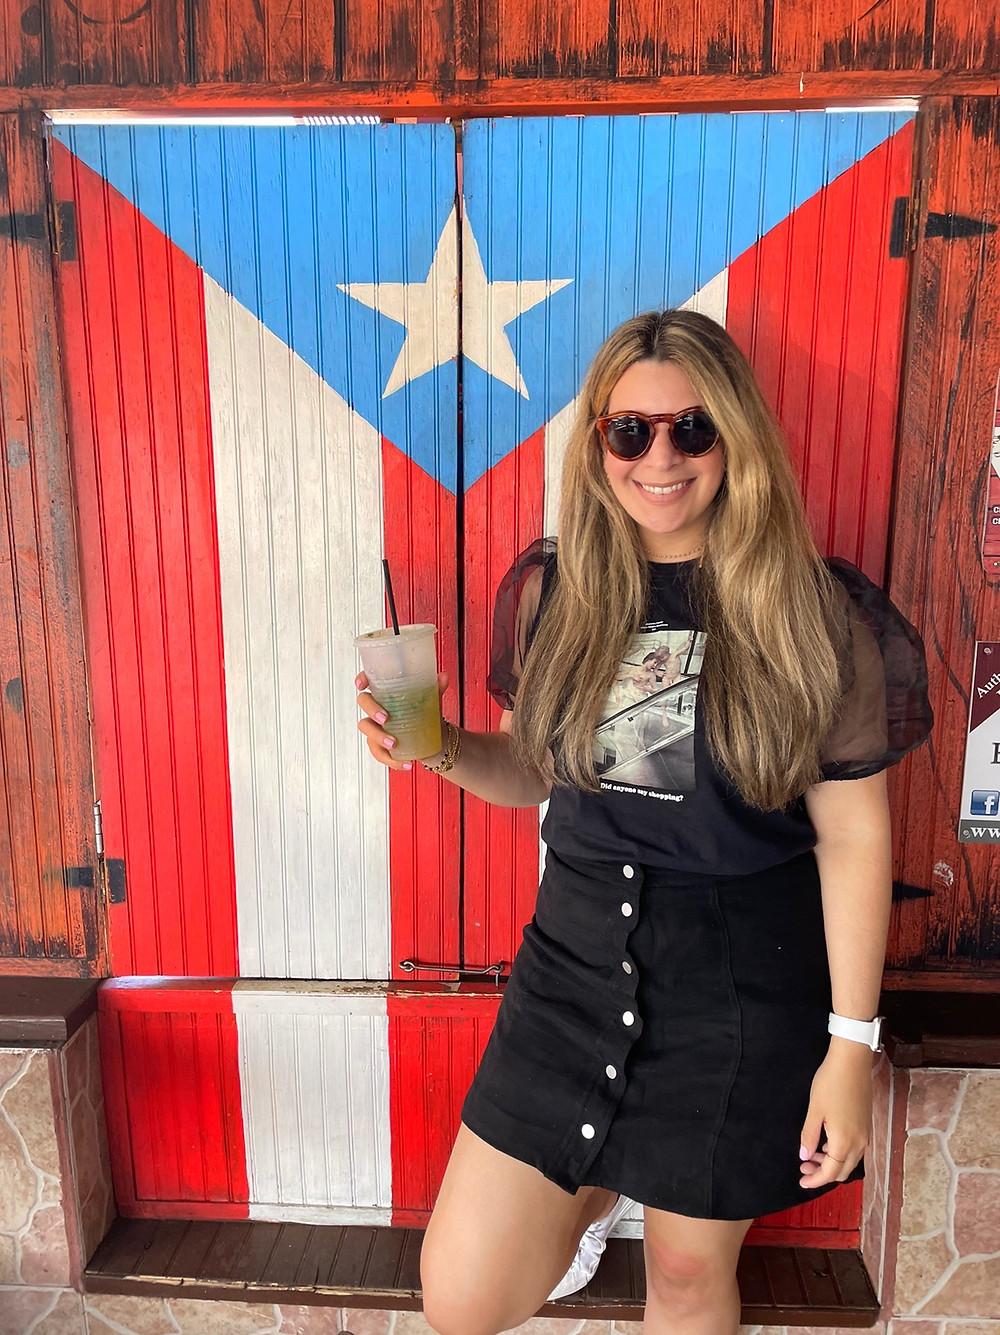 Celebrando el Mes de la Herencia Hispana.